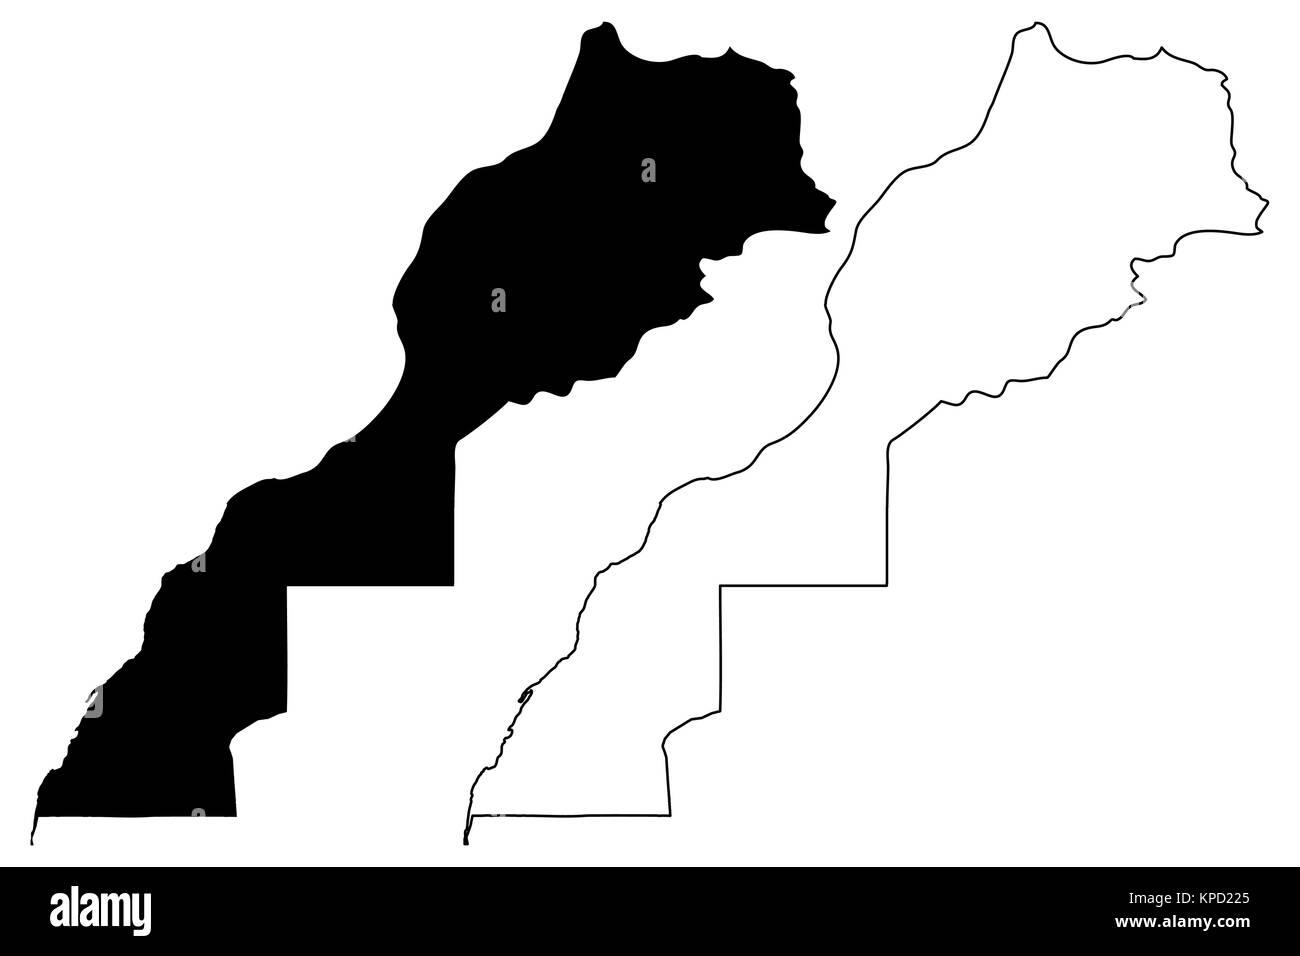 Morocco and Western Sahara map vector illustration, scribble sketch Kingdom of Morocco - Stock Image